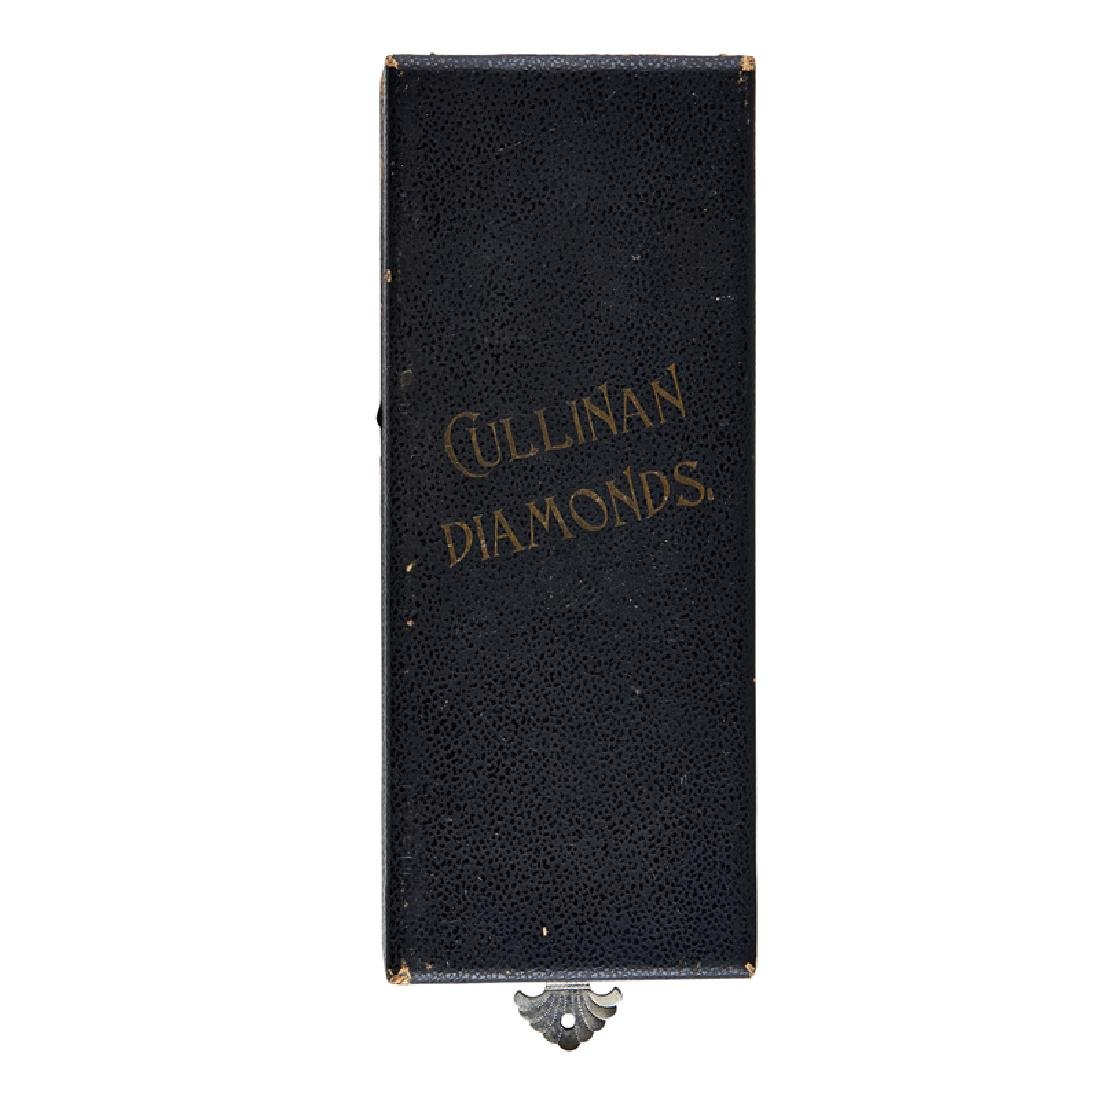 CULLINAN DIAMONDS PASTE SET IN ORIGINAL BOX ETC. - 2